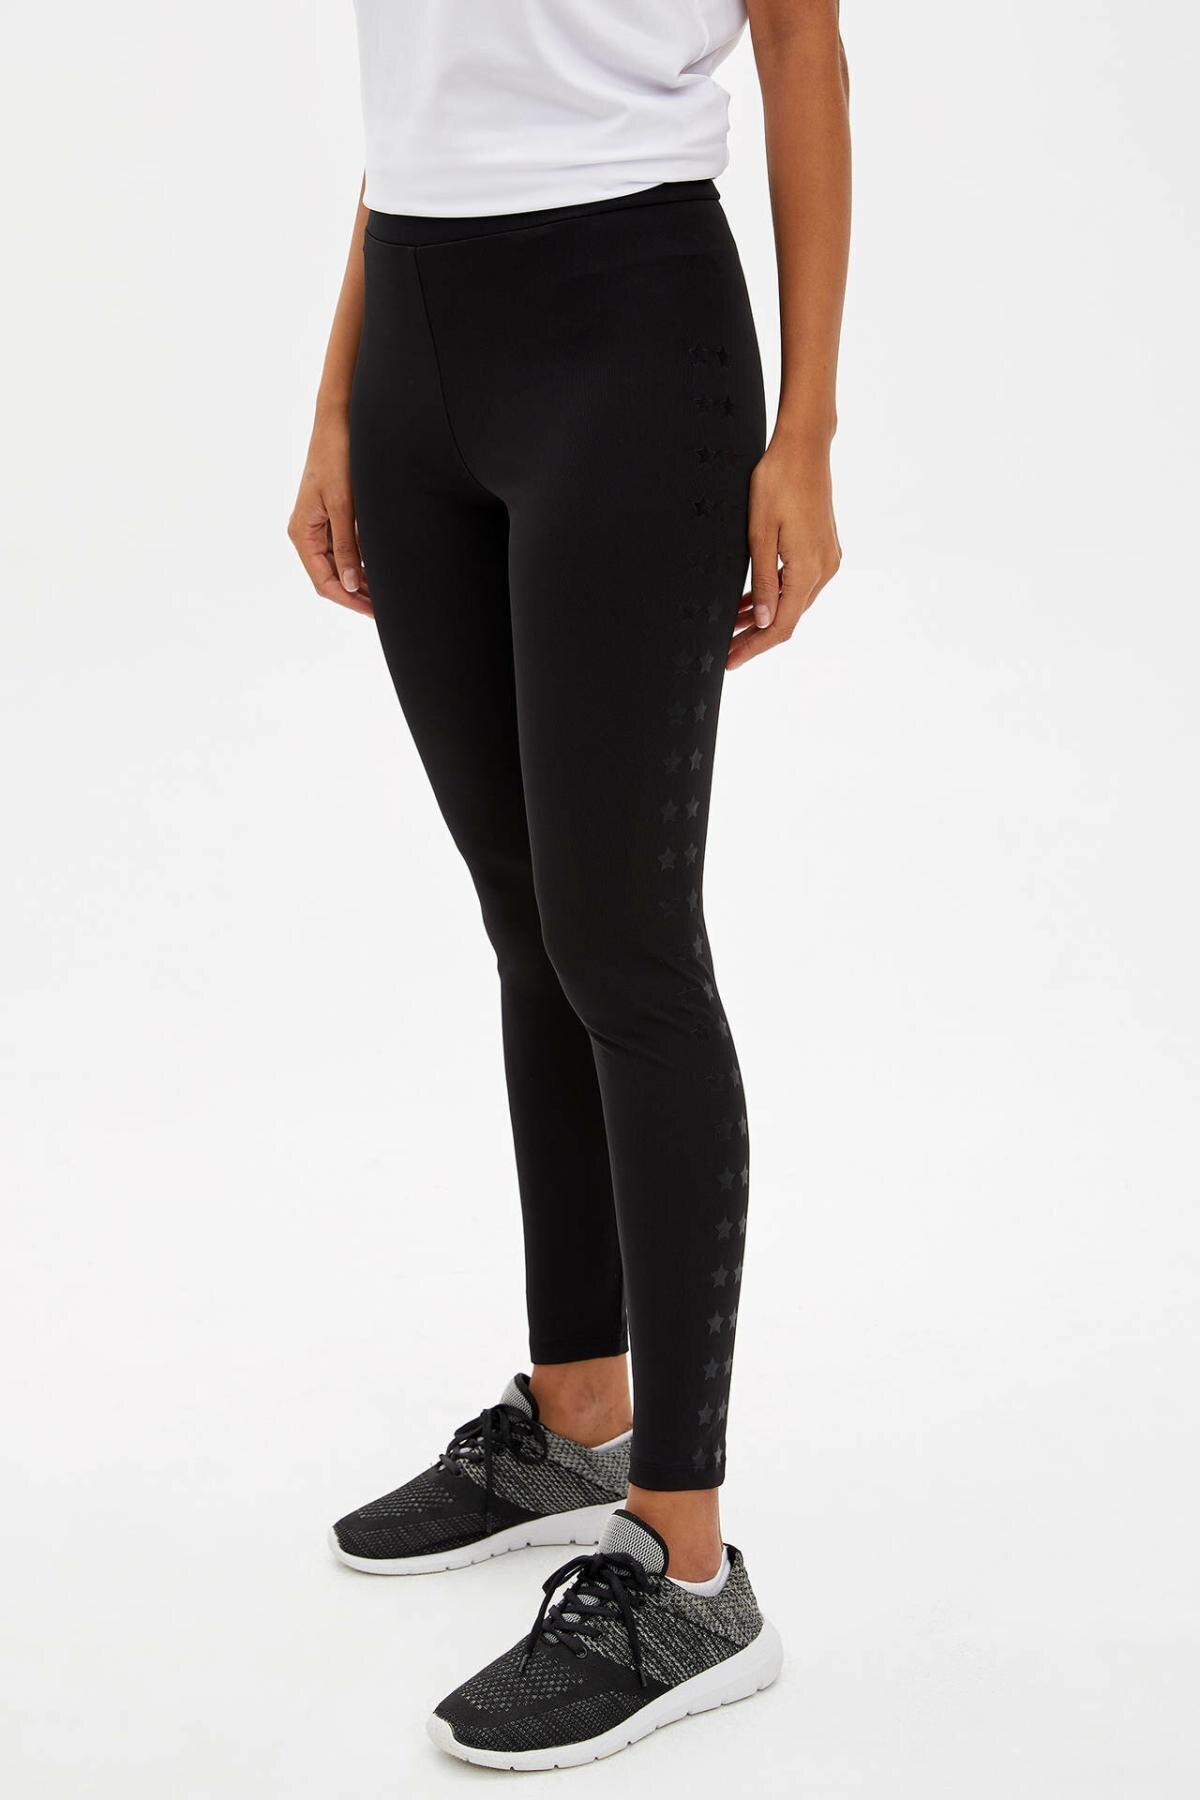 DeFacto Women Fashion Slim High Waist Casual Women's Skinny Black Trousers Ladies Leggings Leisure Crop Pants - M0678AZ19AU